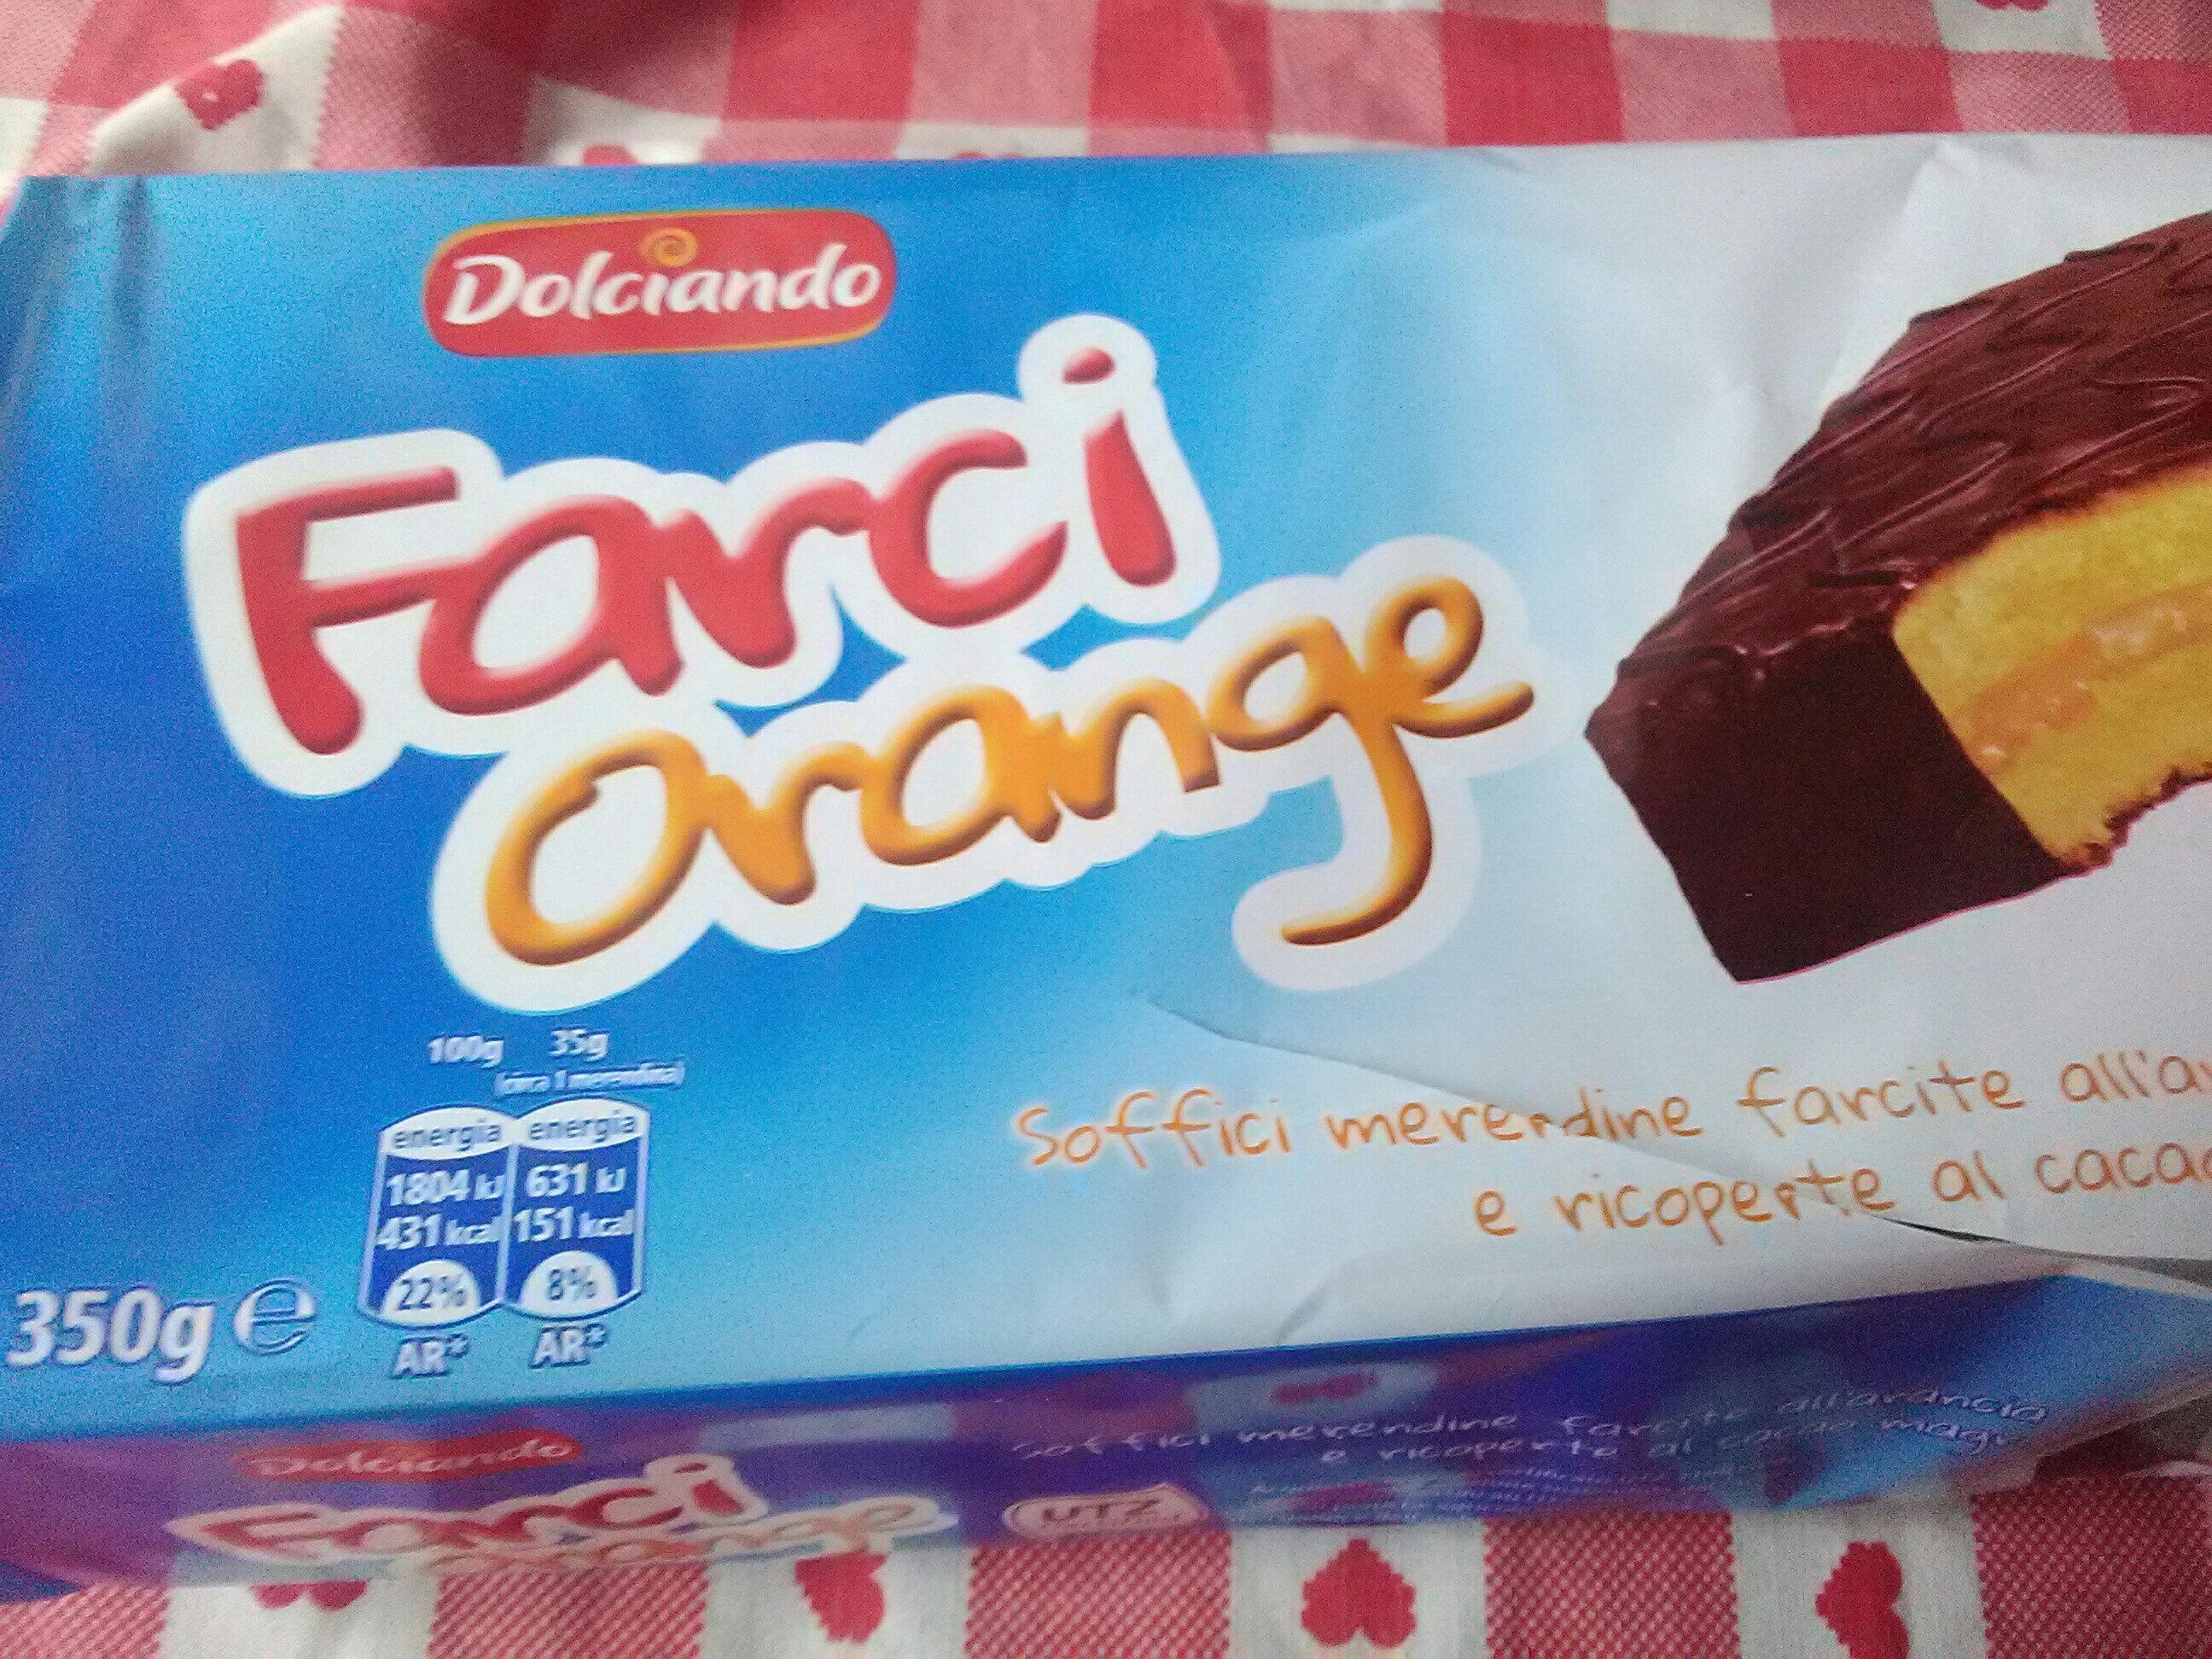 farci Orange - Product - it